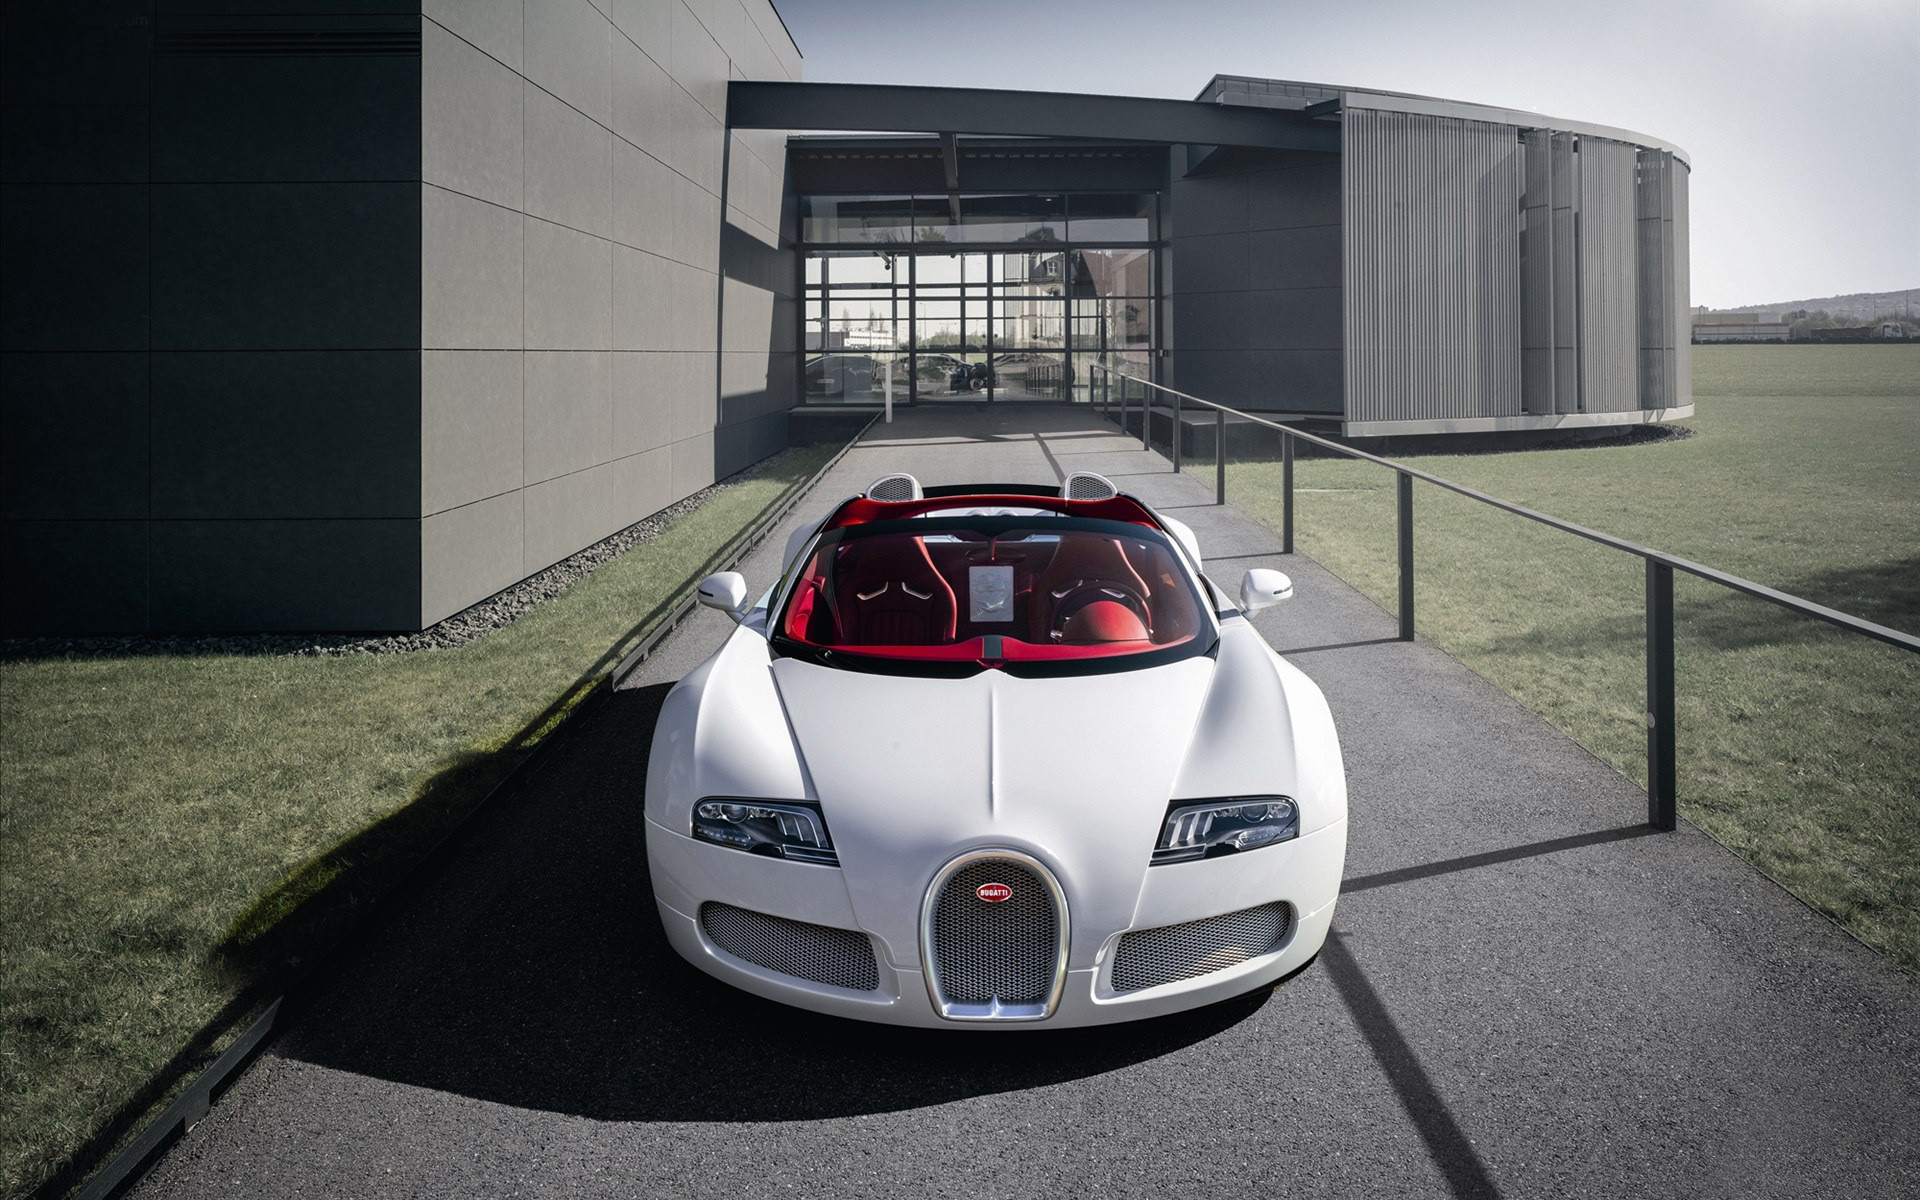 bugatti veyron grand sport vitesse 2012 3 wallpaper hd car wallpapers. Black Bedroom Furniture Sets. Home Design Ideas